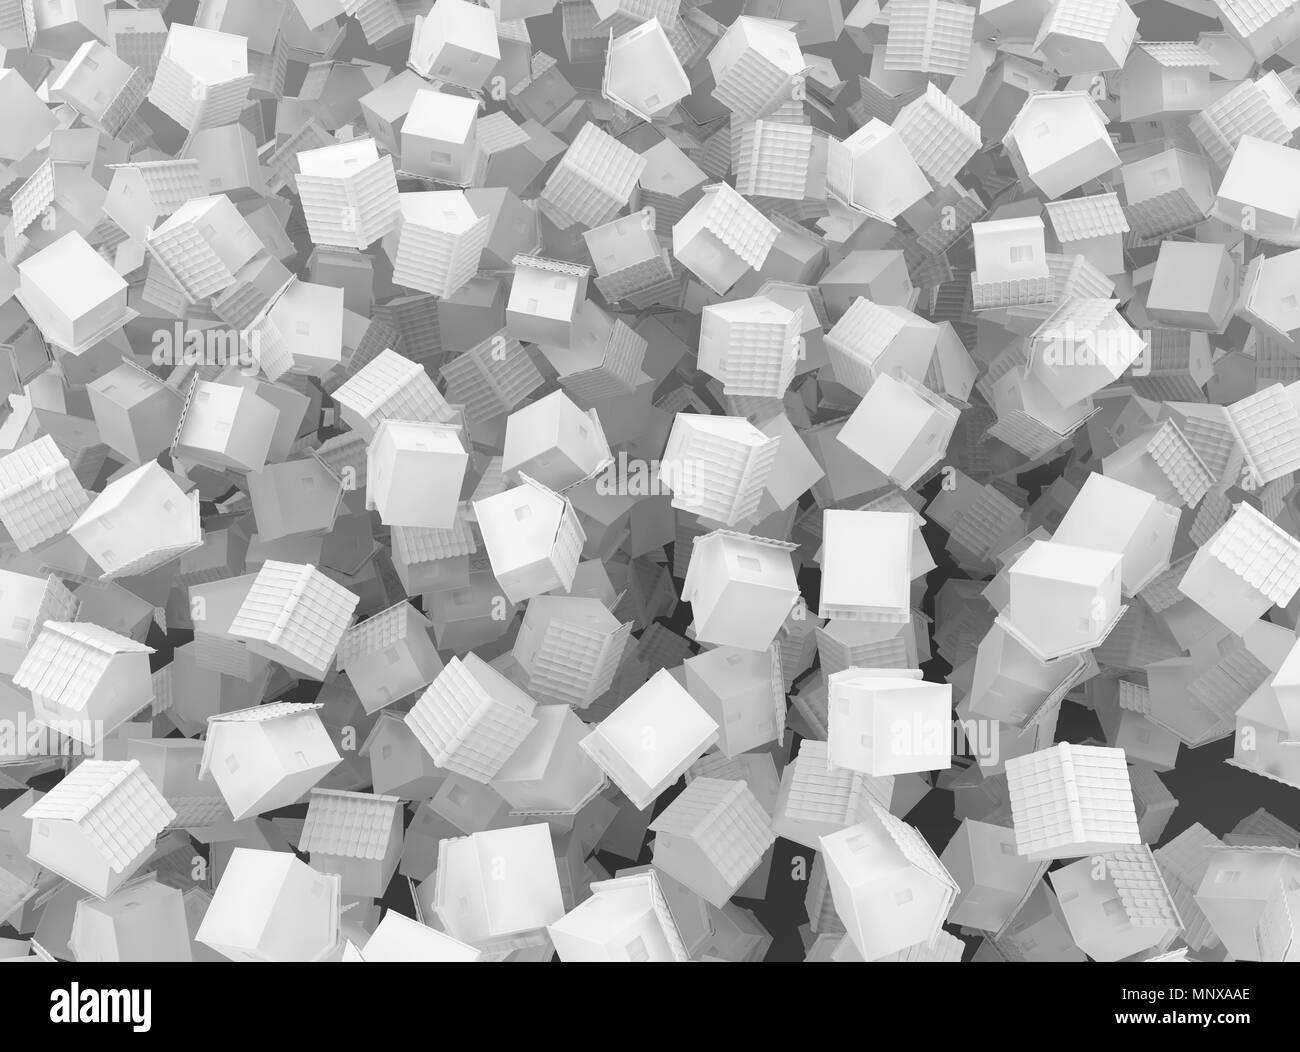 Pequeñas casitas blancas de dispersión caótica, ilustración, 3d horizontal de fondo Imagen De Stock